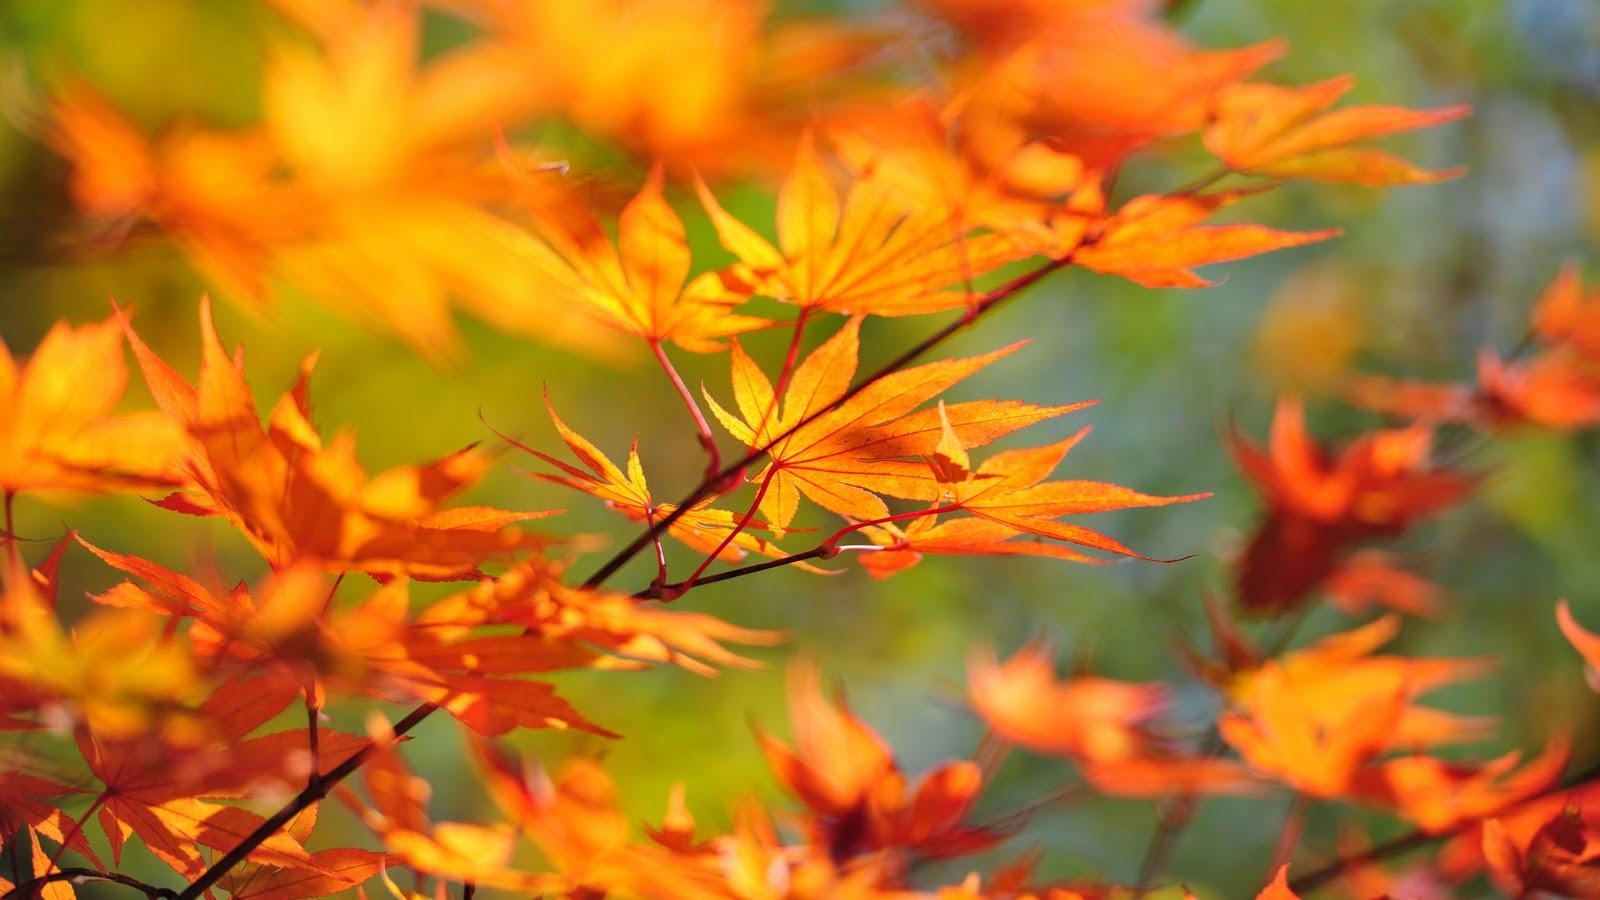 Beautiful Autumn Season Wallpapers HD | Nice Wallpapers